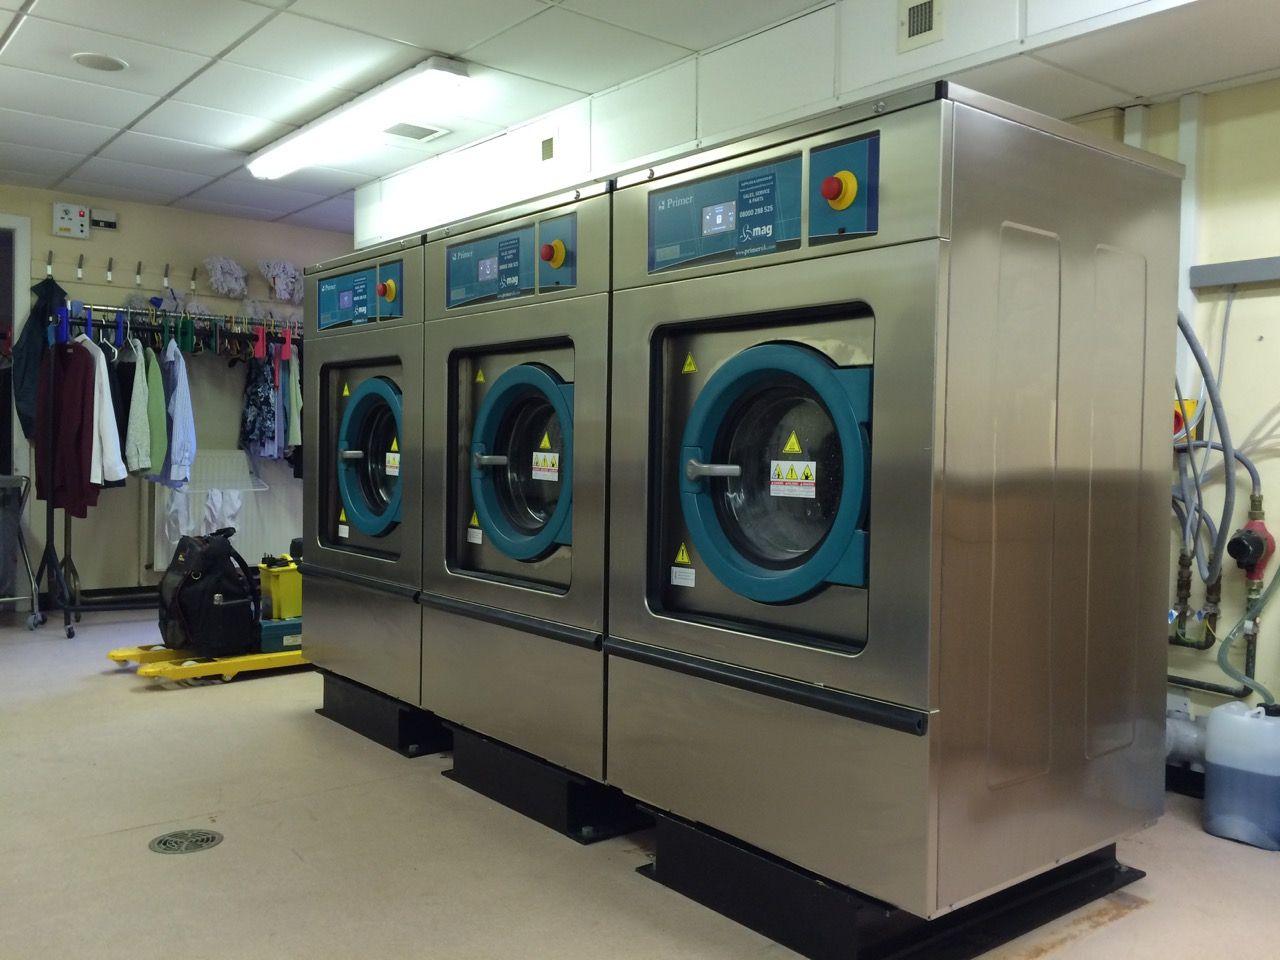 Industrial Laundry Equipment | photos | installing | Laundry equipment, Commercial  laundry, Laundry machine